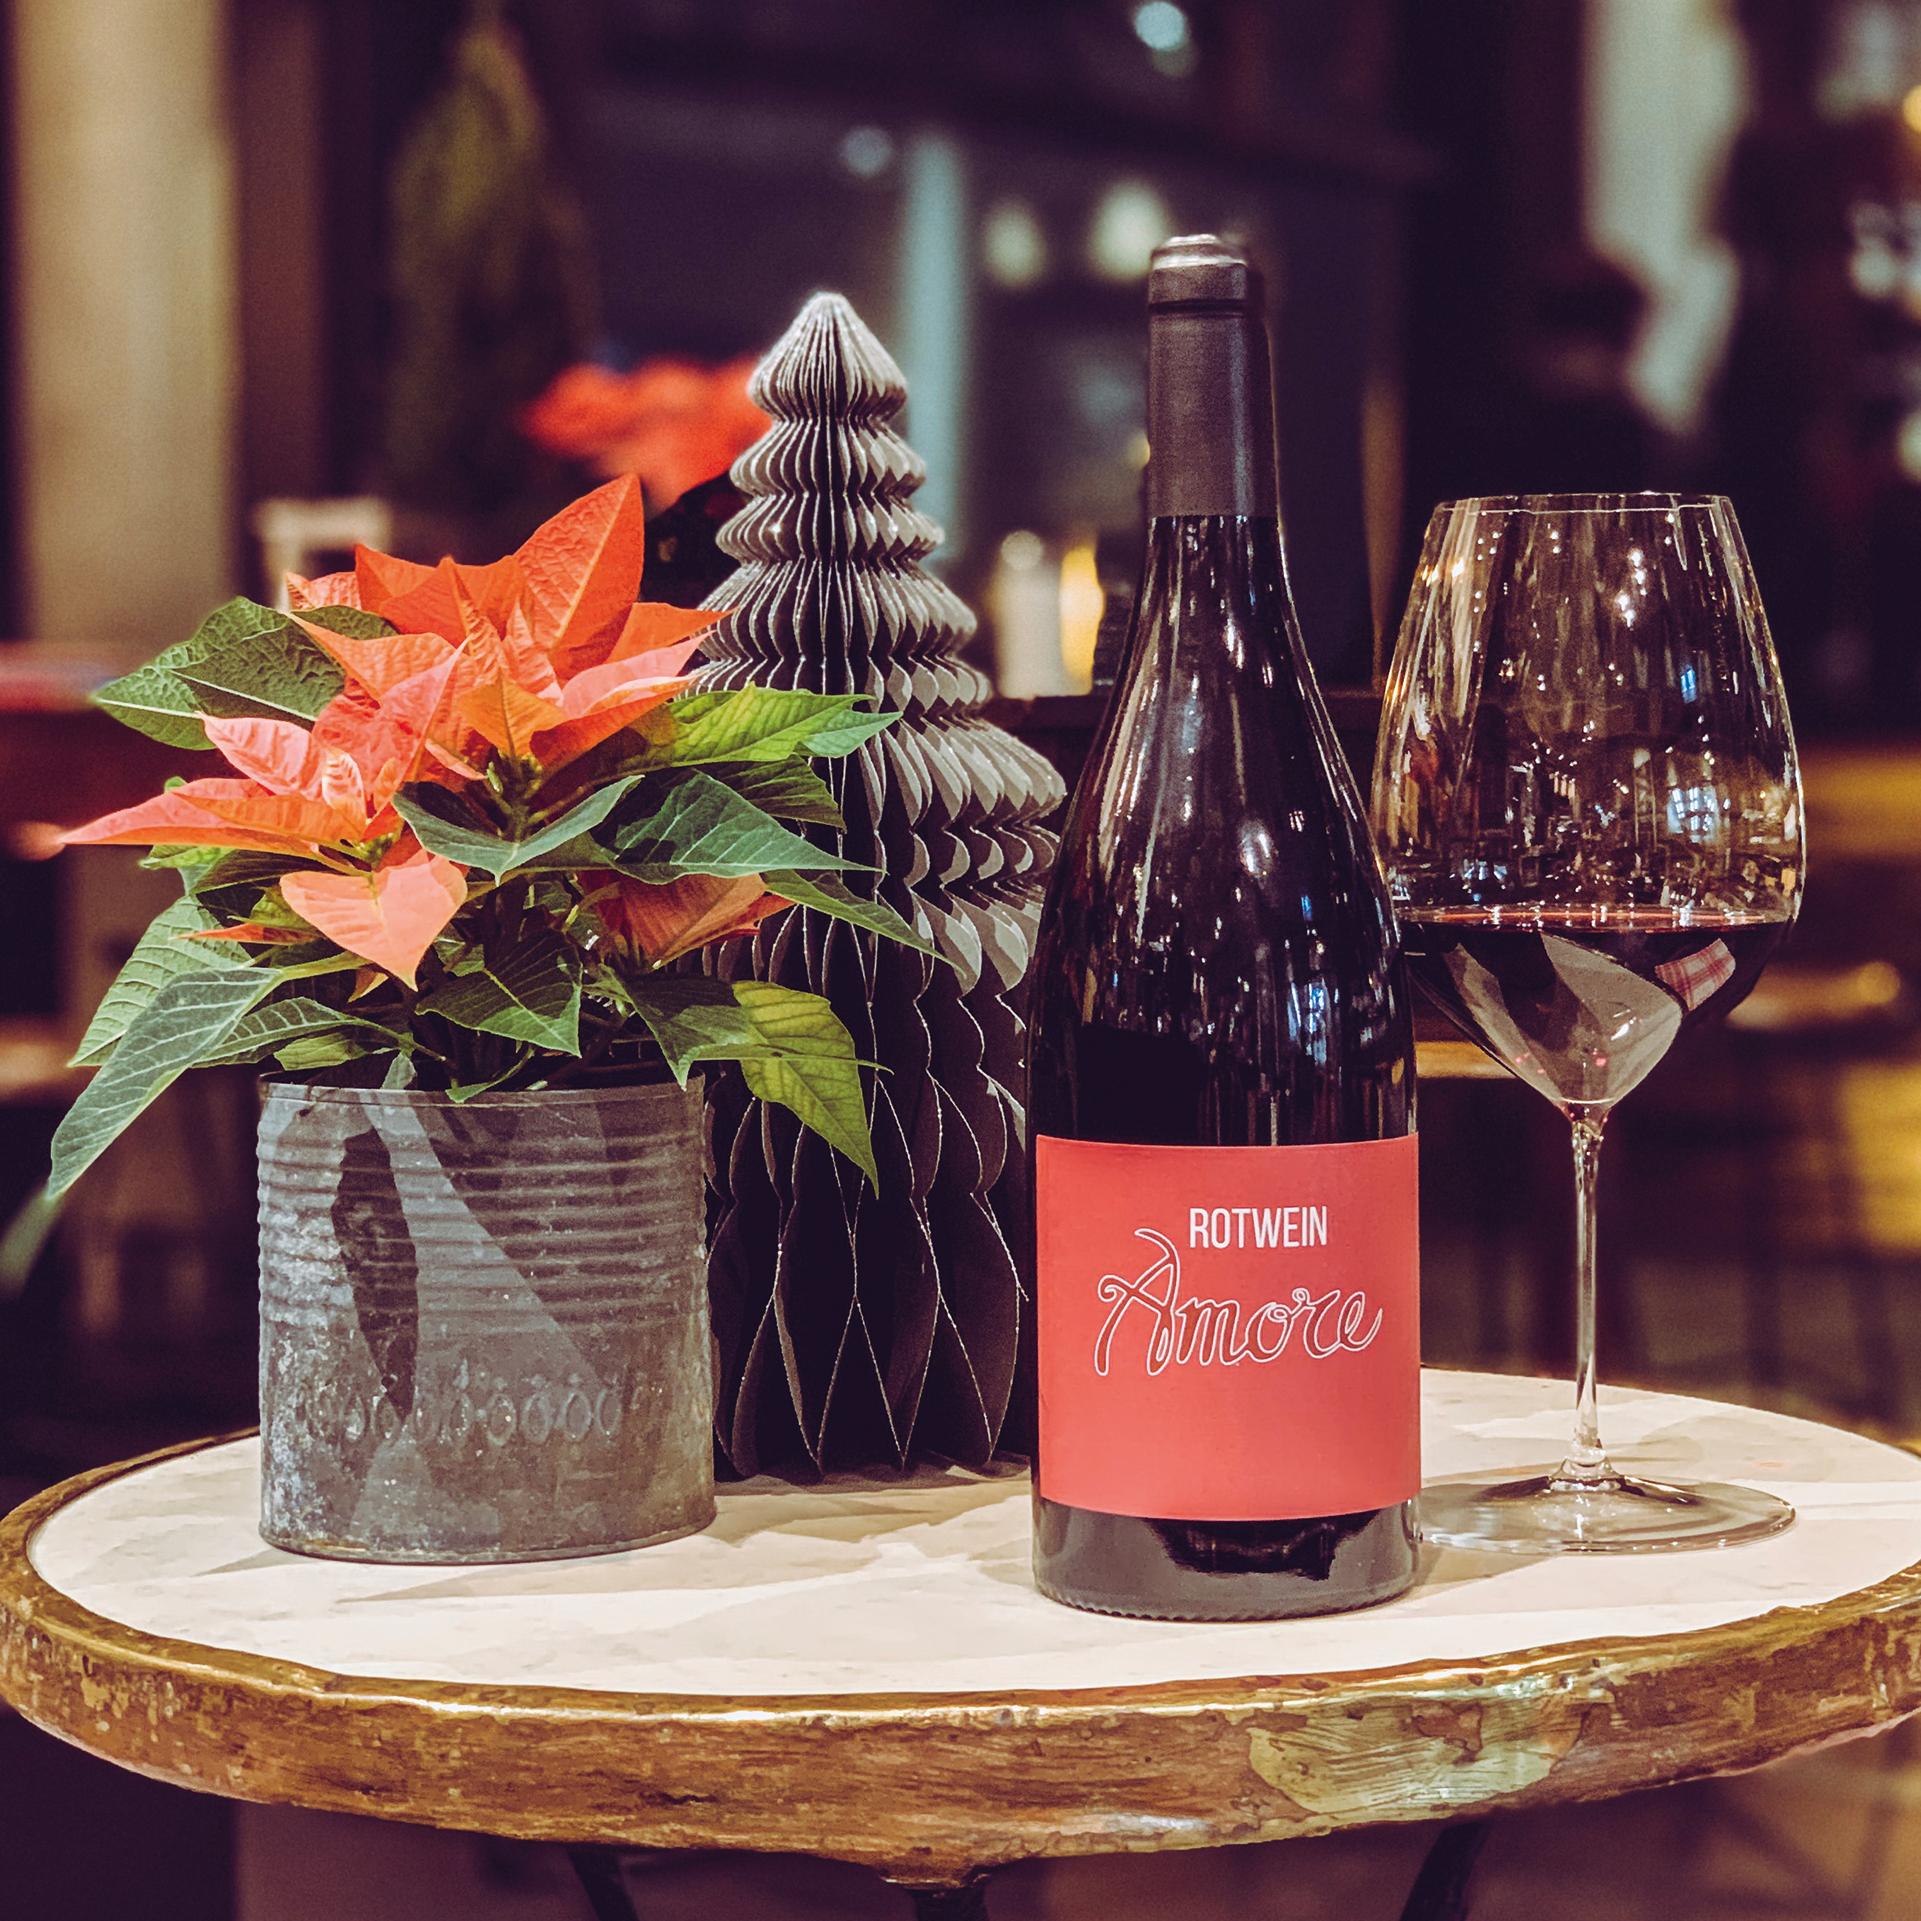 DINZLER Amore Rotwein Cuvée 2016 - Weingut Klumpp